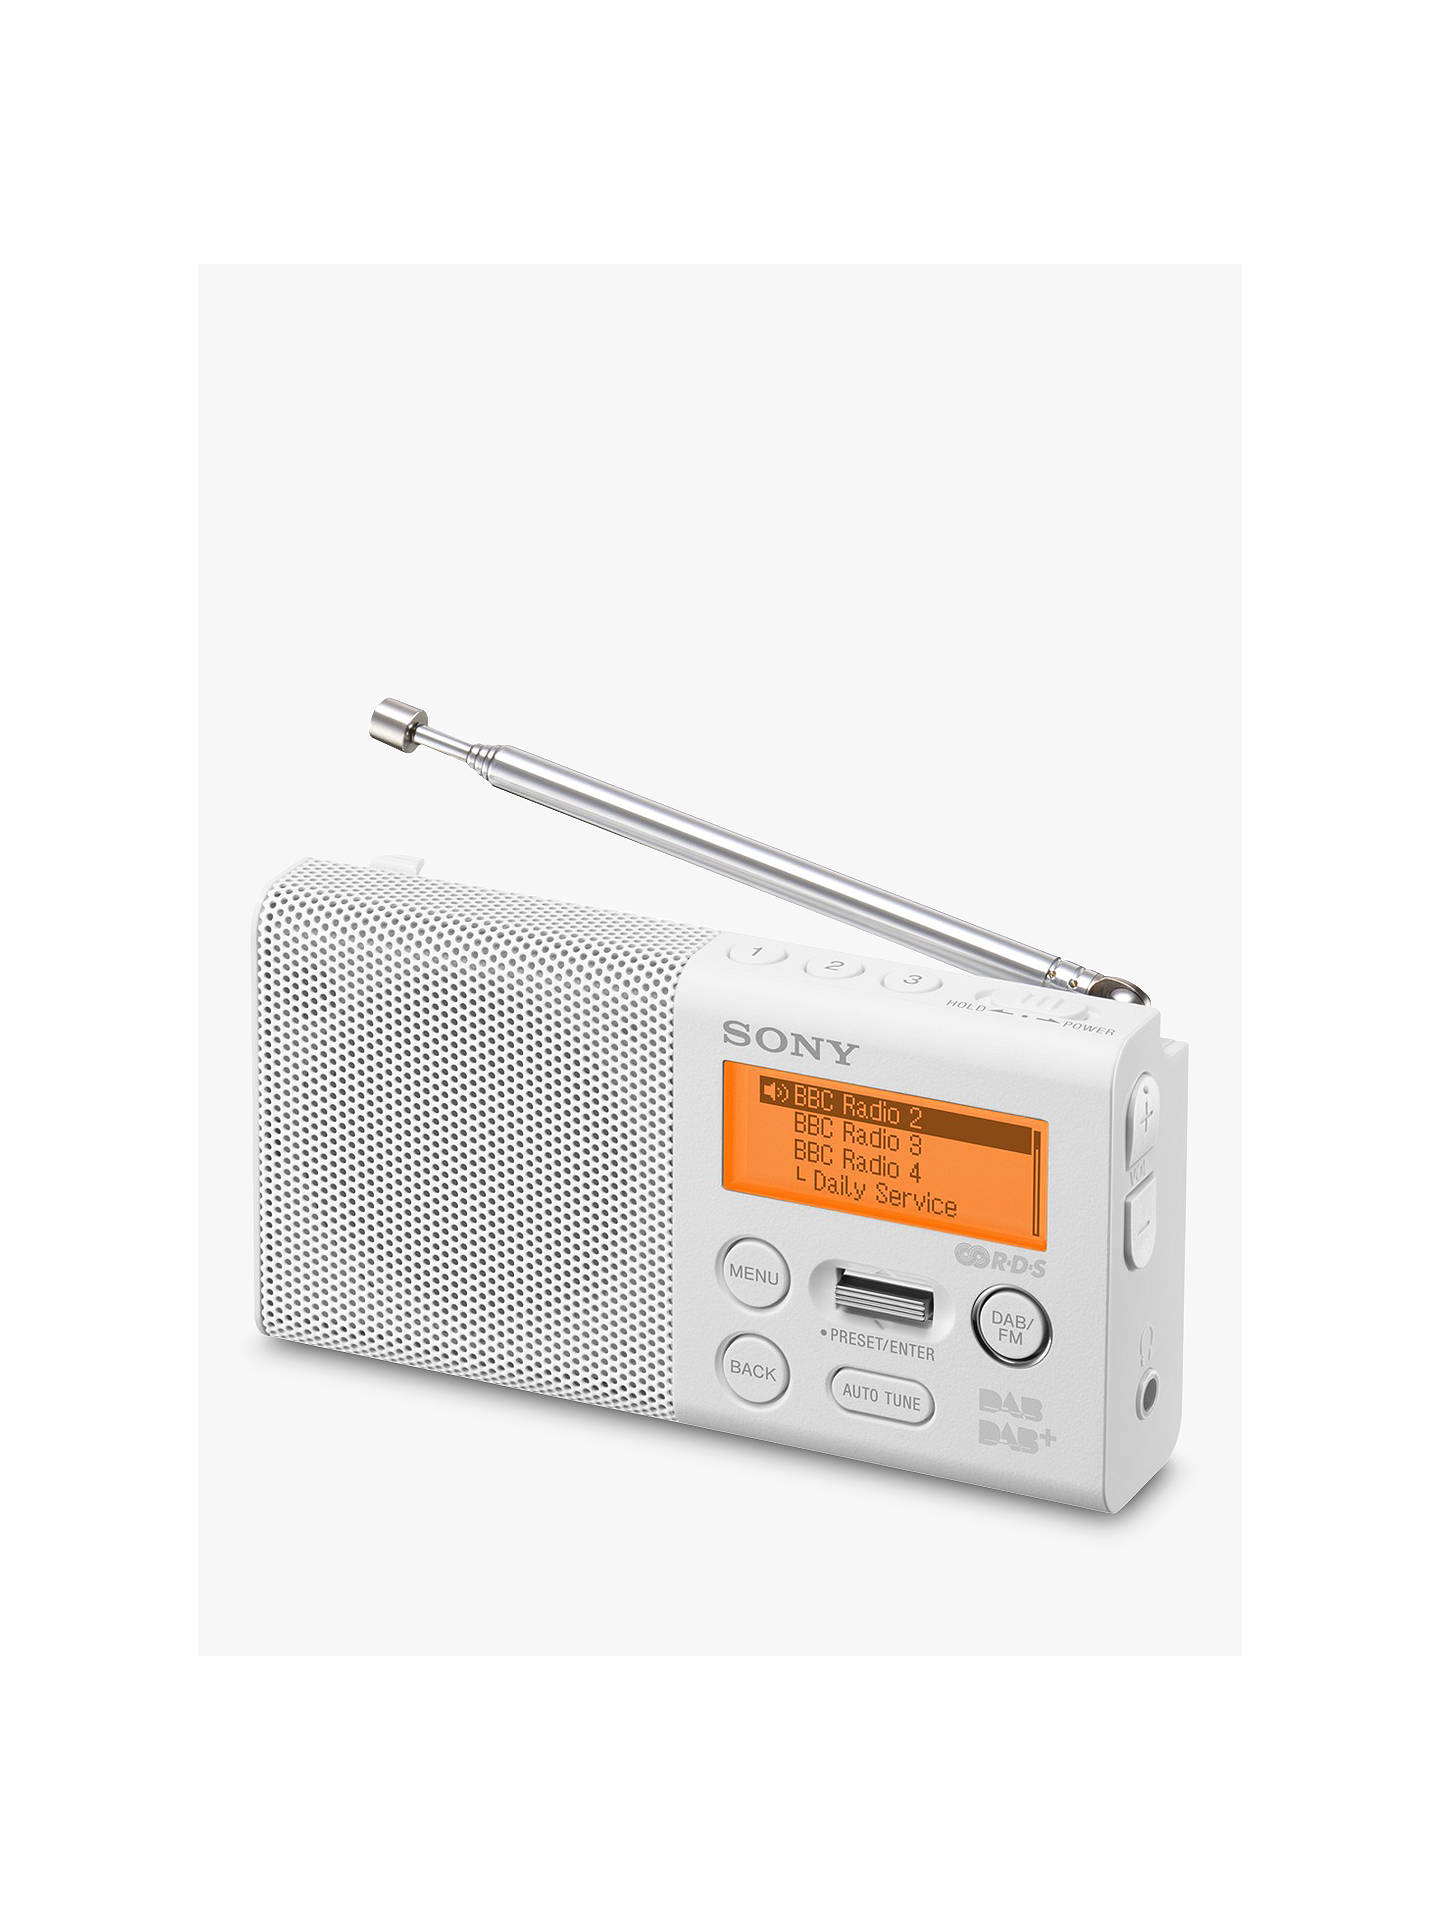 Sony Xdr P1 Portable Dab/Dab+/Fm Digital Radio, White by Sony